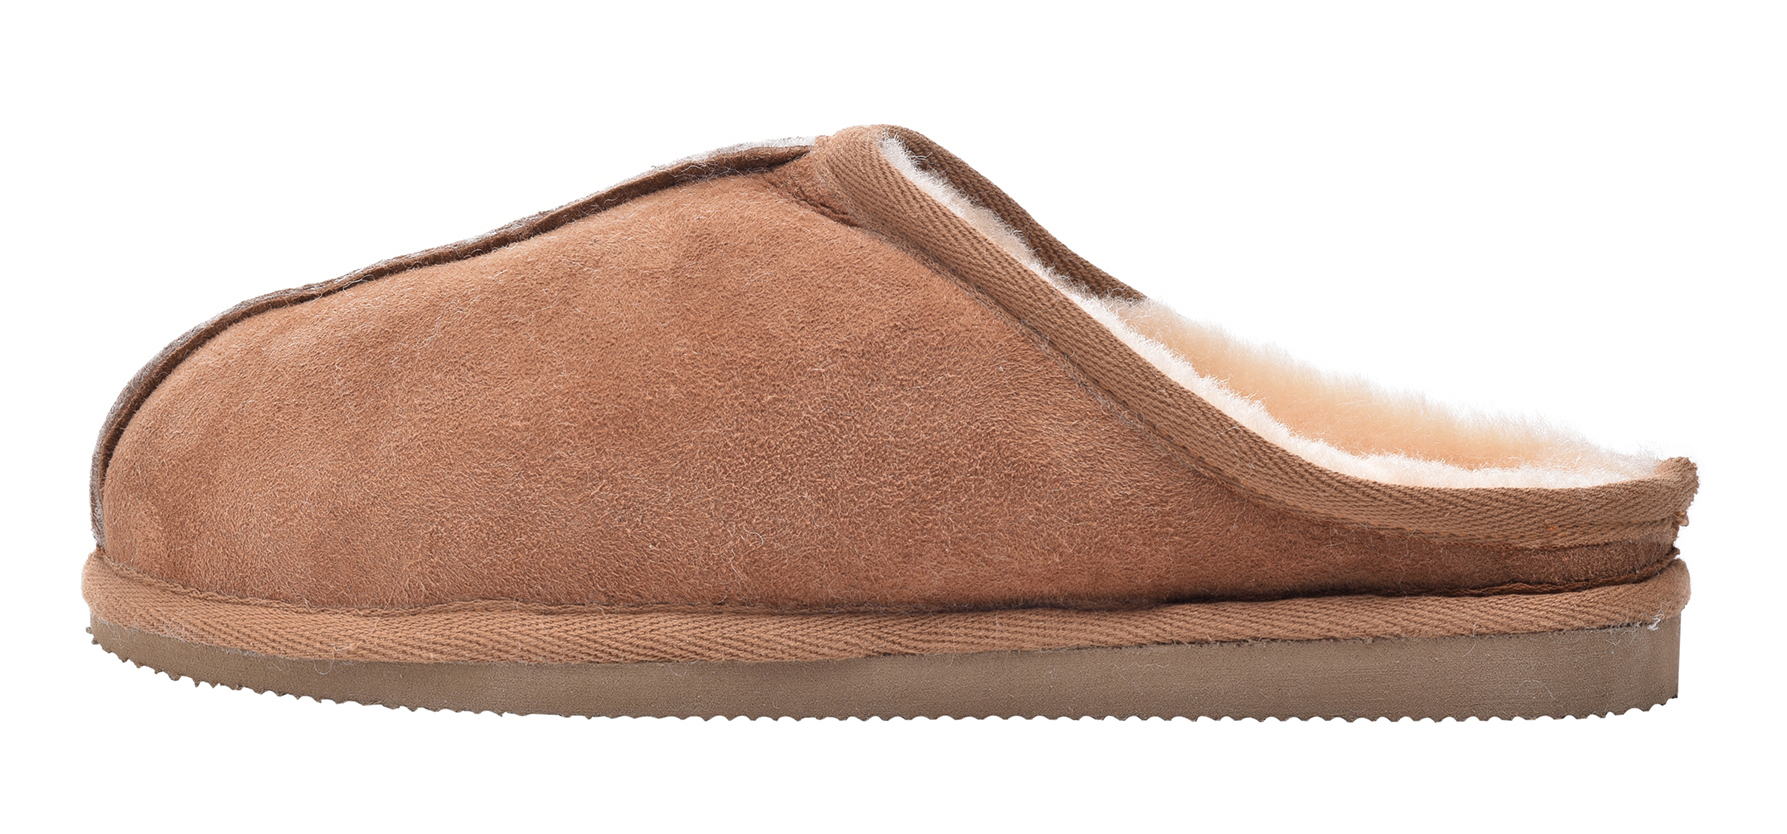 Ladies-Genuine-Sheepskin-Mule-Slippers-with-EVA-Sole-by-Shepherd-Liv